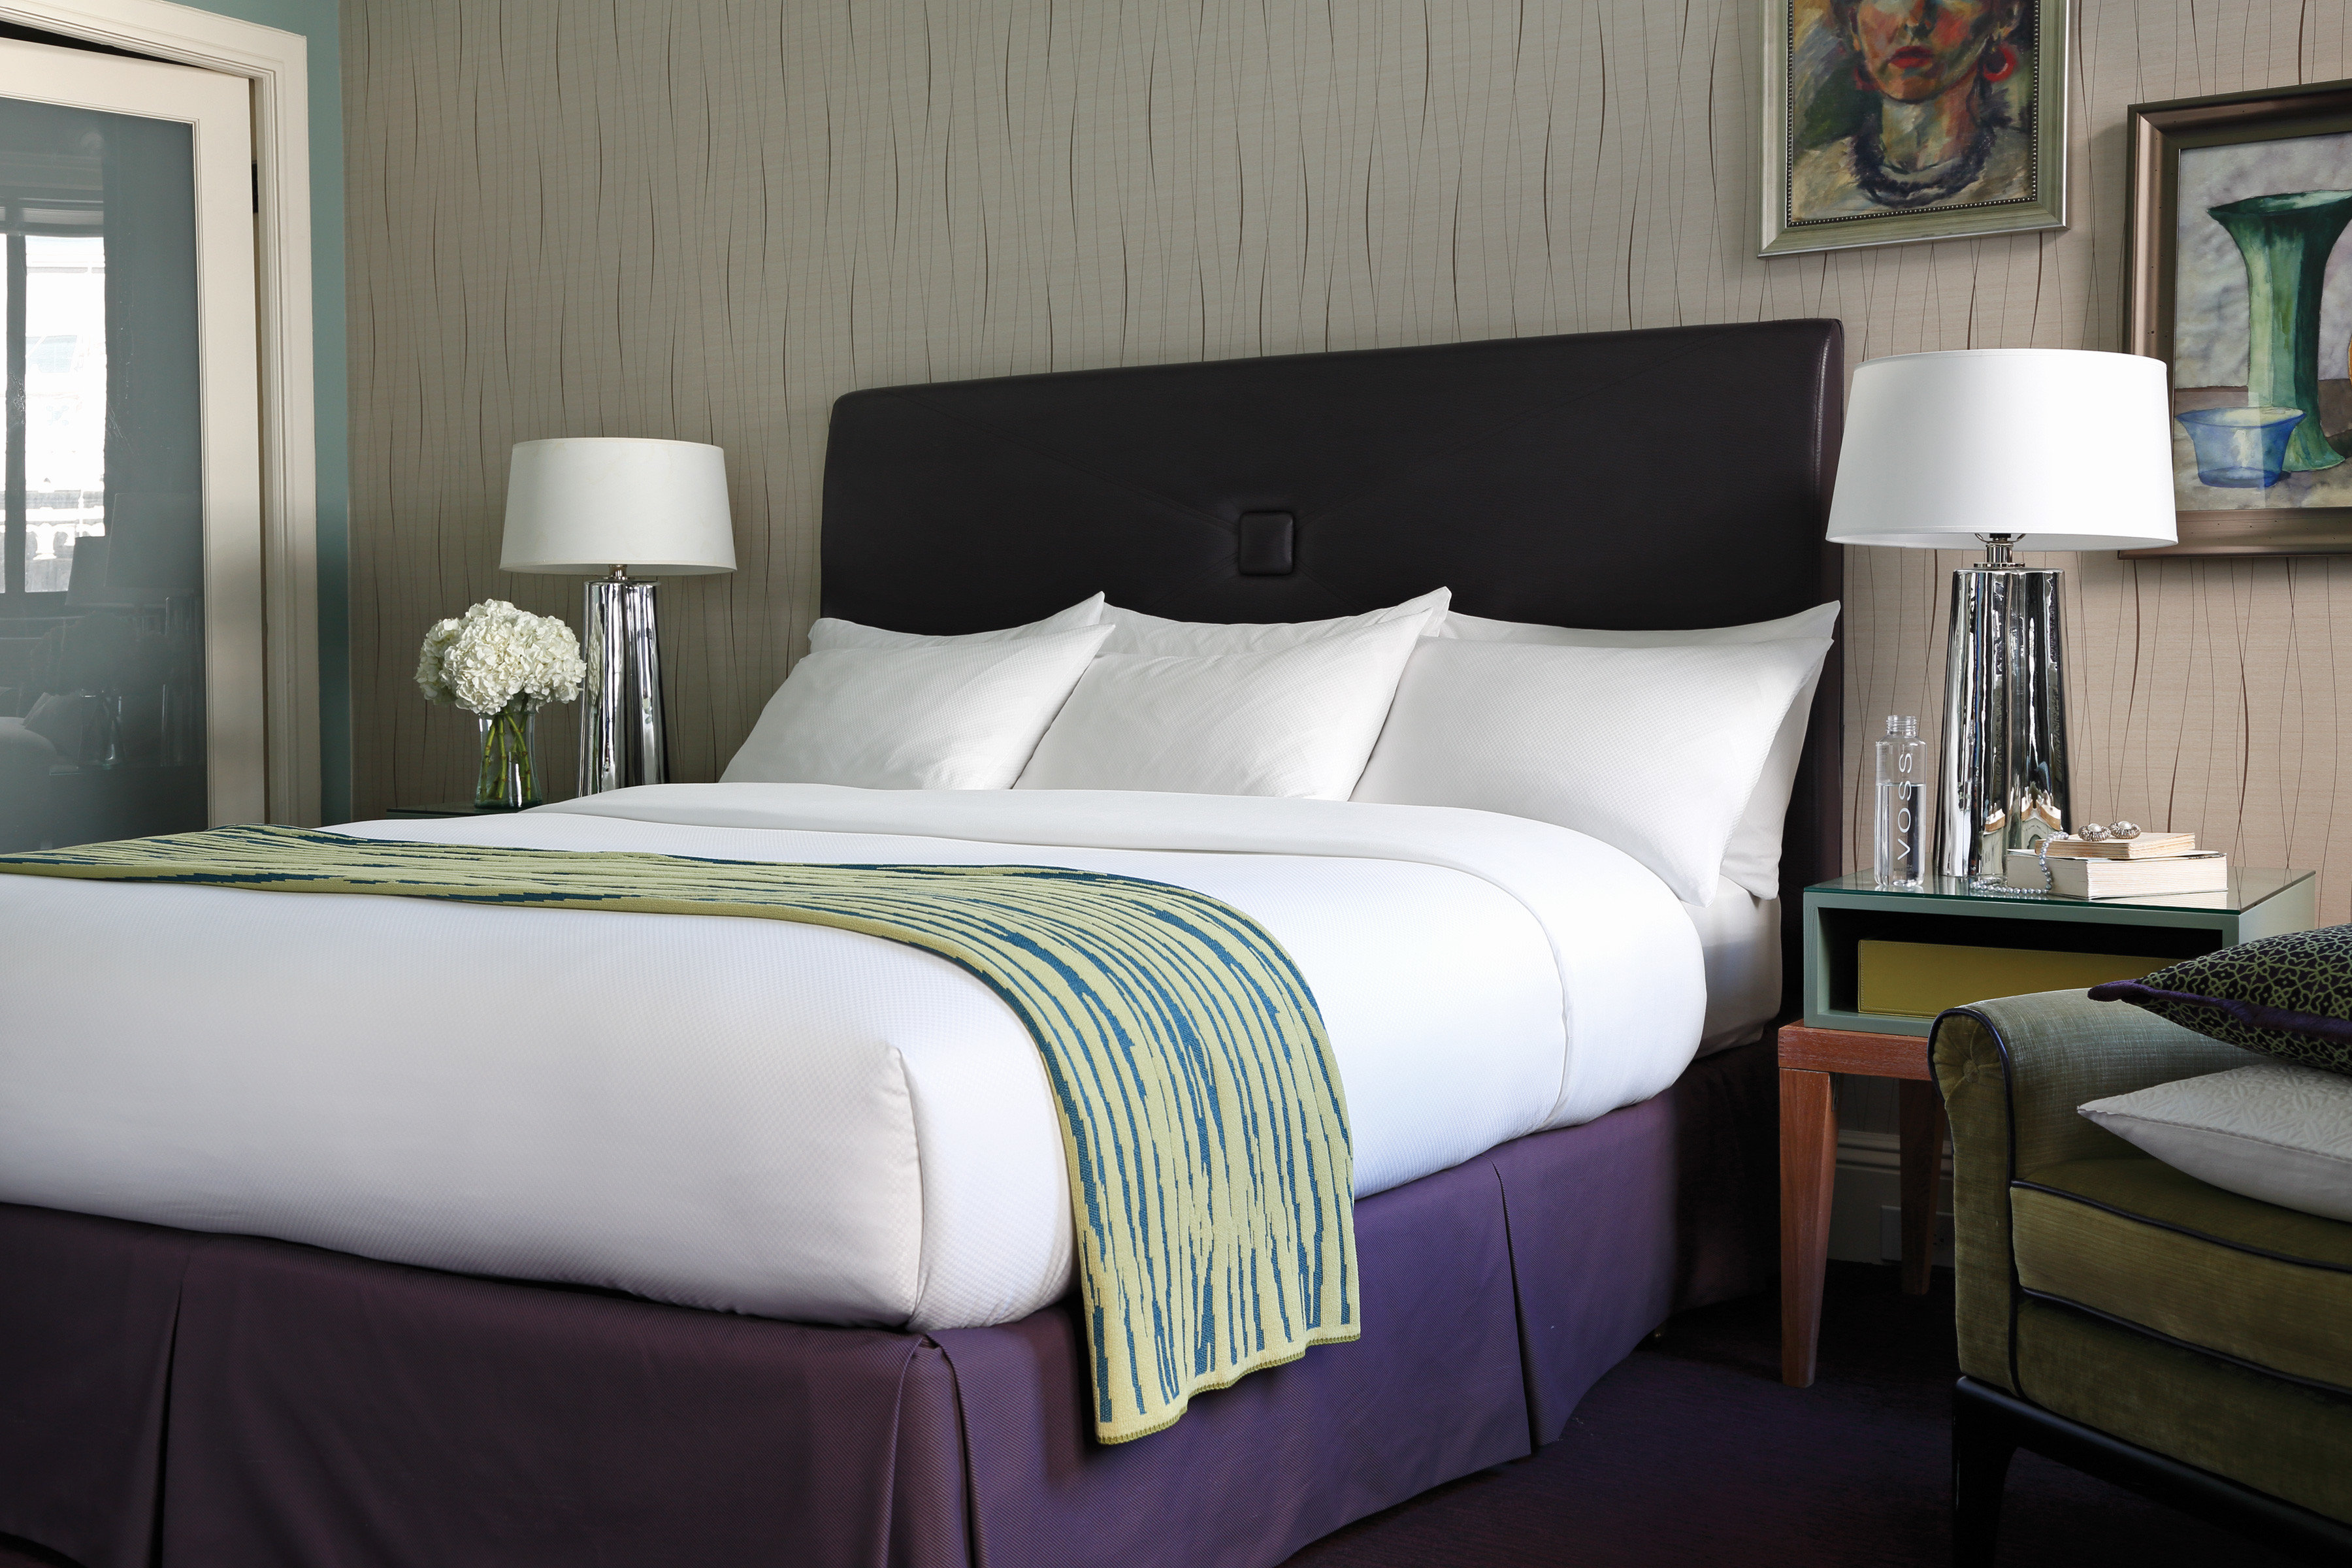 Bedroom Boutique City Historic sofa property Suite green bed sheet home bed frame cottage lamp